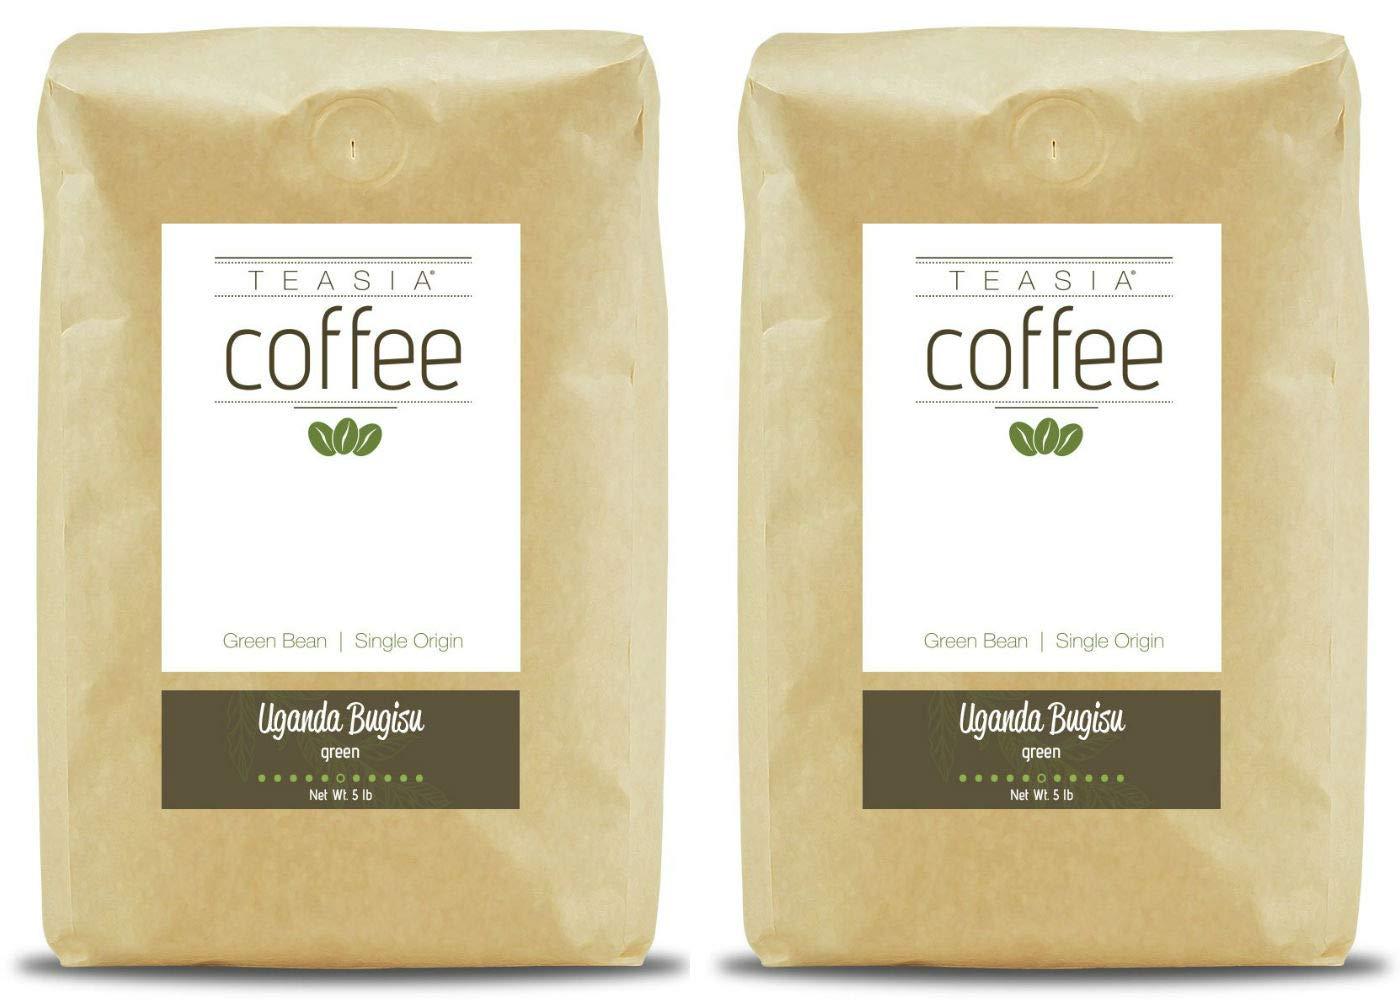 Teasia Coffee, Uganda Bugisu, Single Origin Fair Trade, Green Unroasted Whole Coffee Beans, 5-Pound Bag (2-Pack) by Teasia